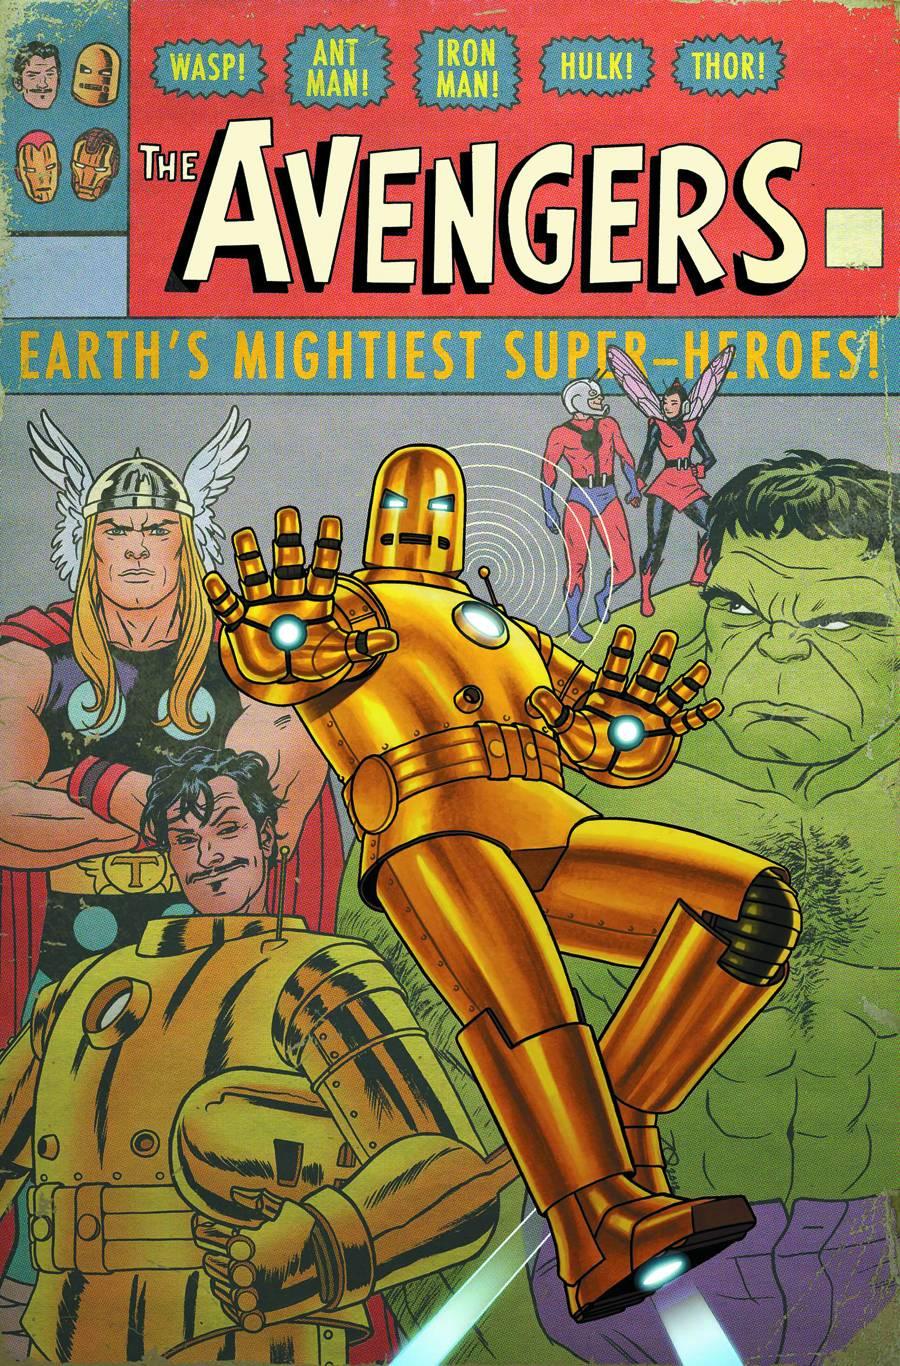 Avengers Vol 5 9 Many Armors of Iron Man Variant Textless.jpg